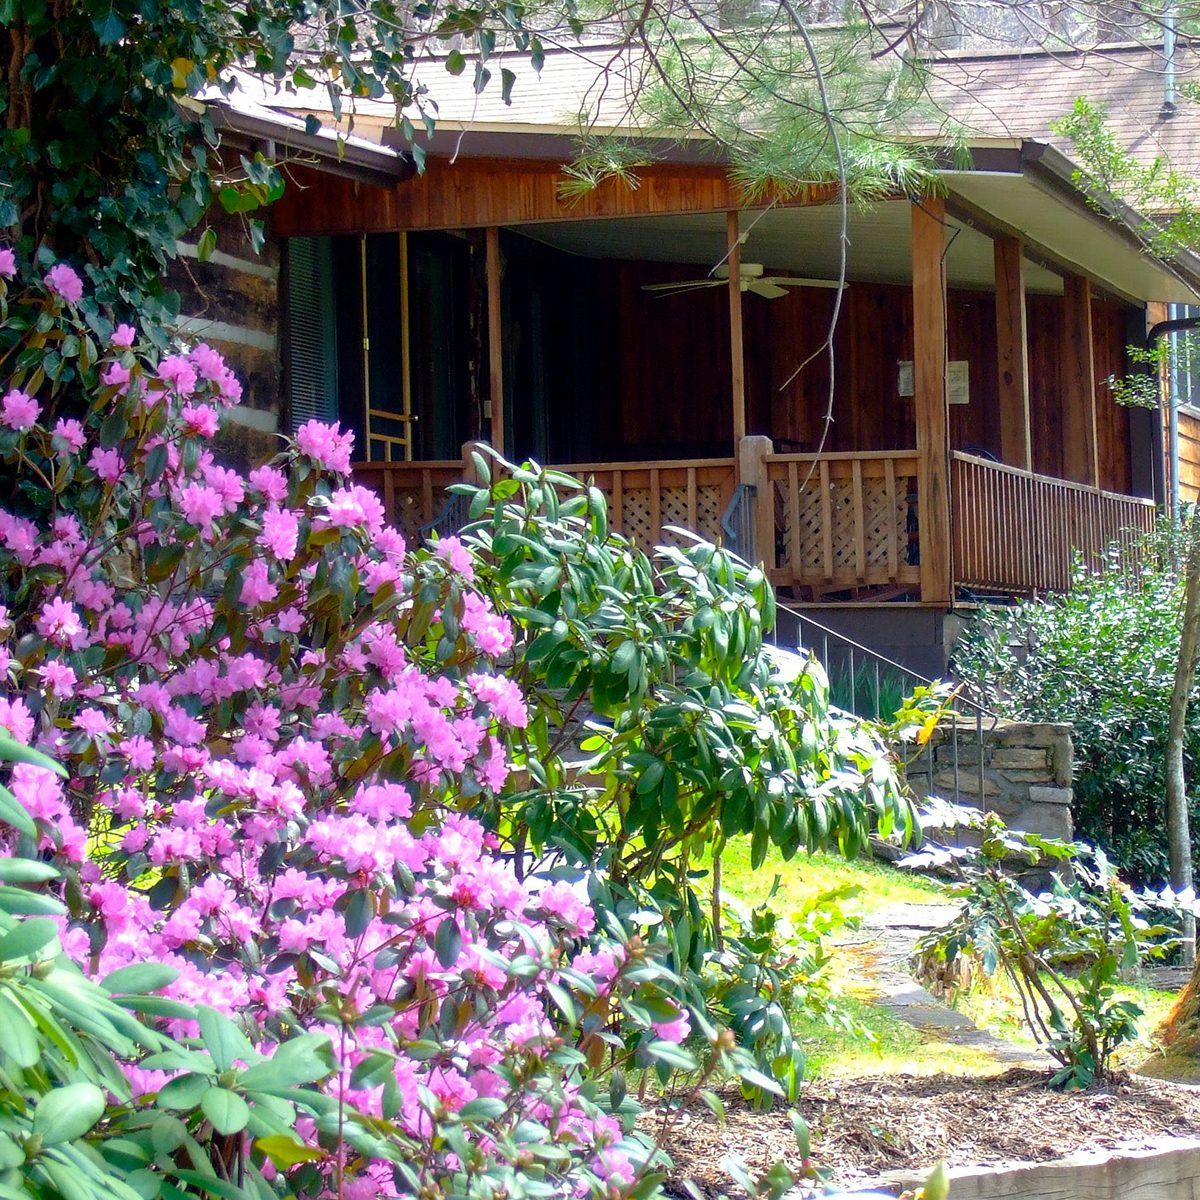 North Carolina Ashevilla Cabins of Willow Winds